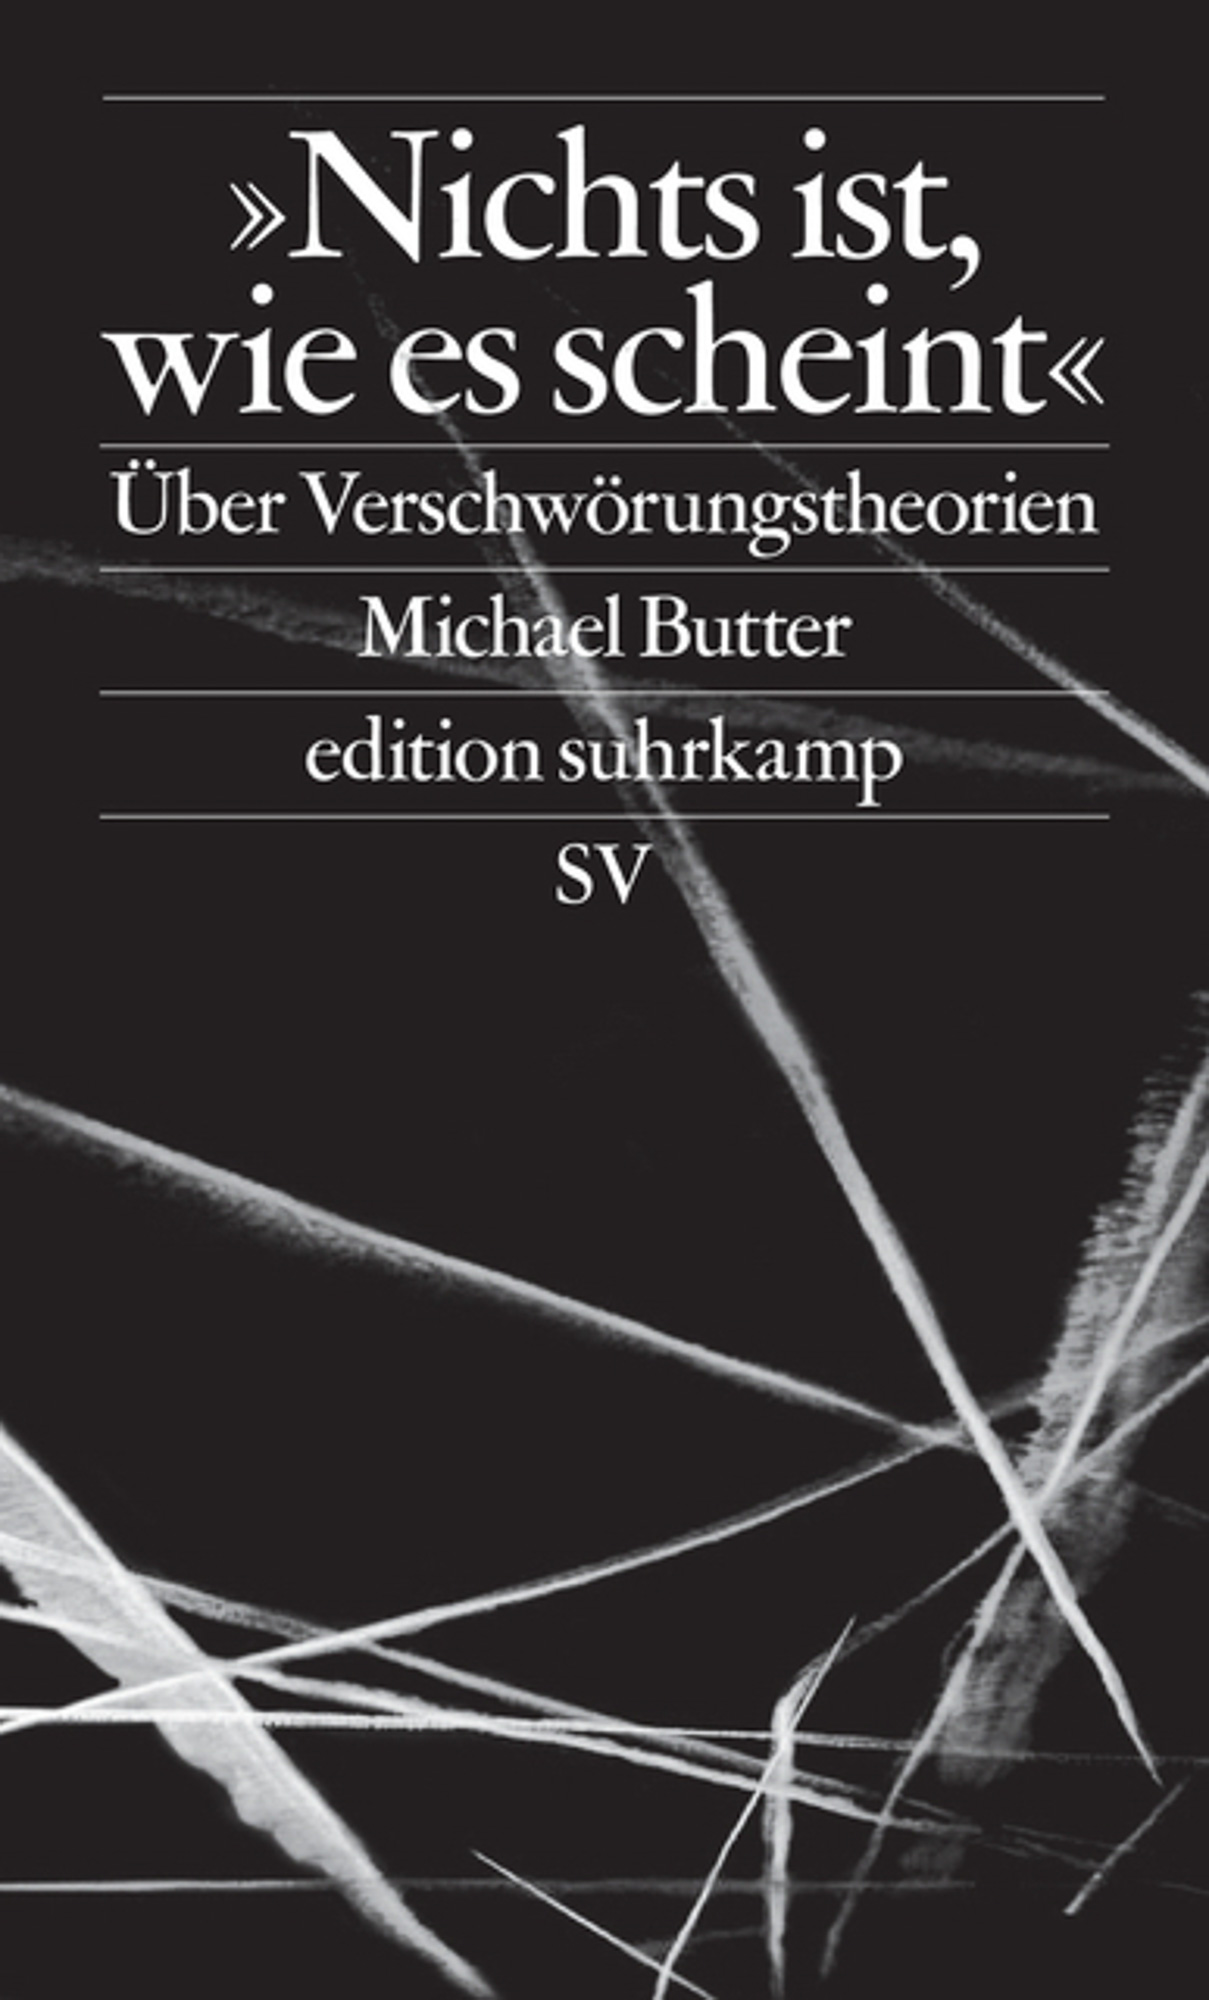 FO_verschwö_Cover_G48_387 x 640.jpg